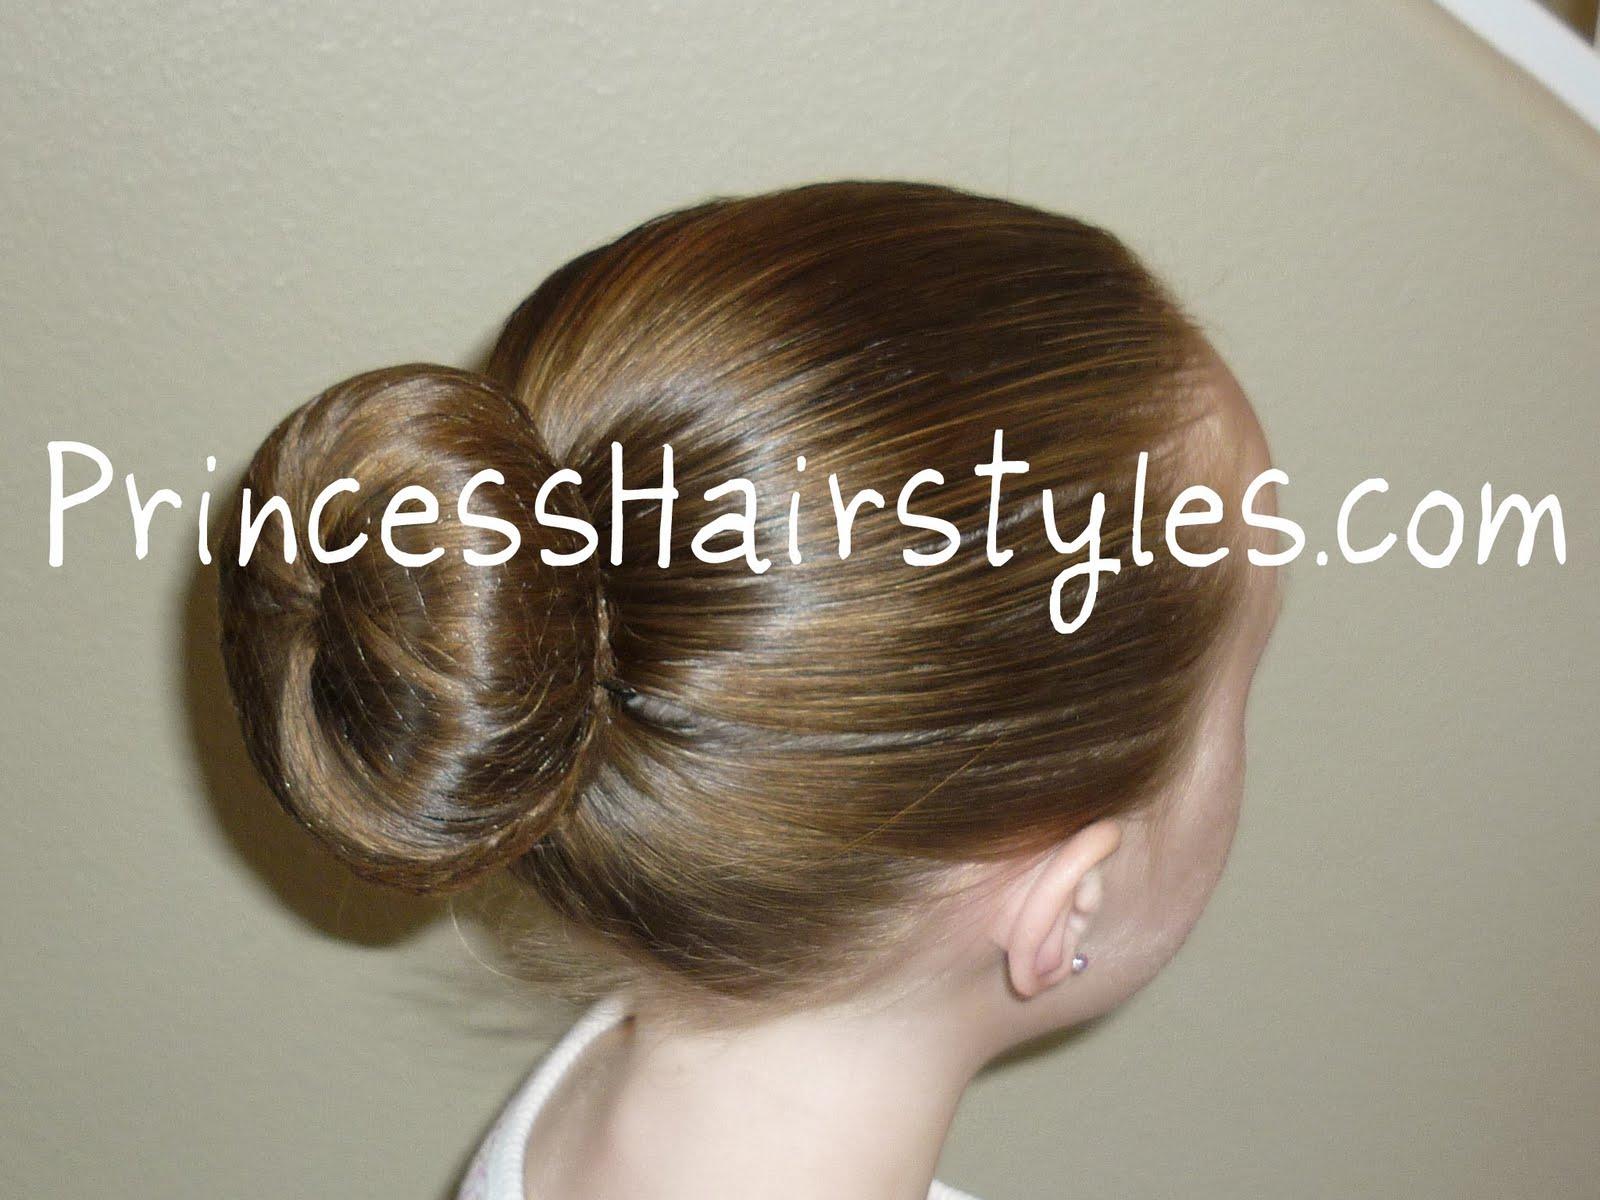 Fine The Perfect Ballet Bun Hairstyles For Girls Princess Hairstyles Short Hairstyles For Black Women Fulllsitofus